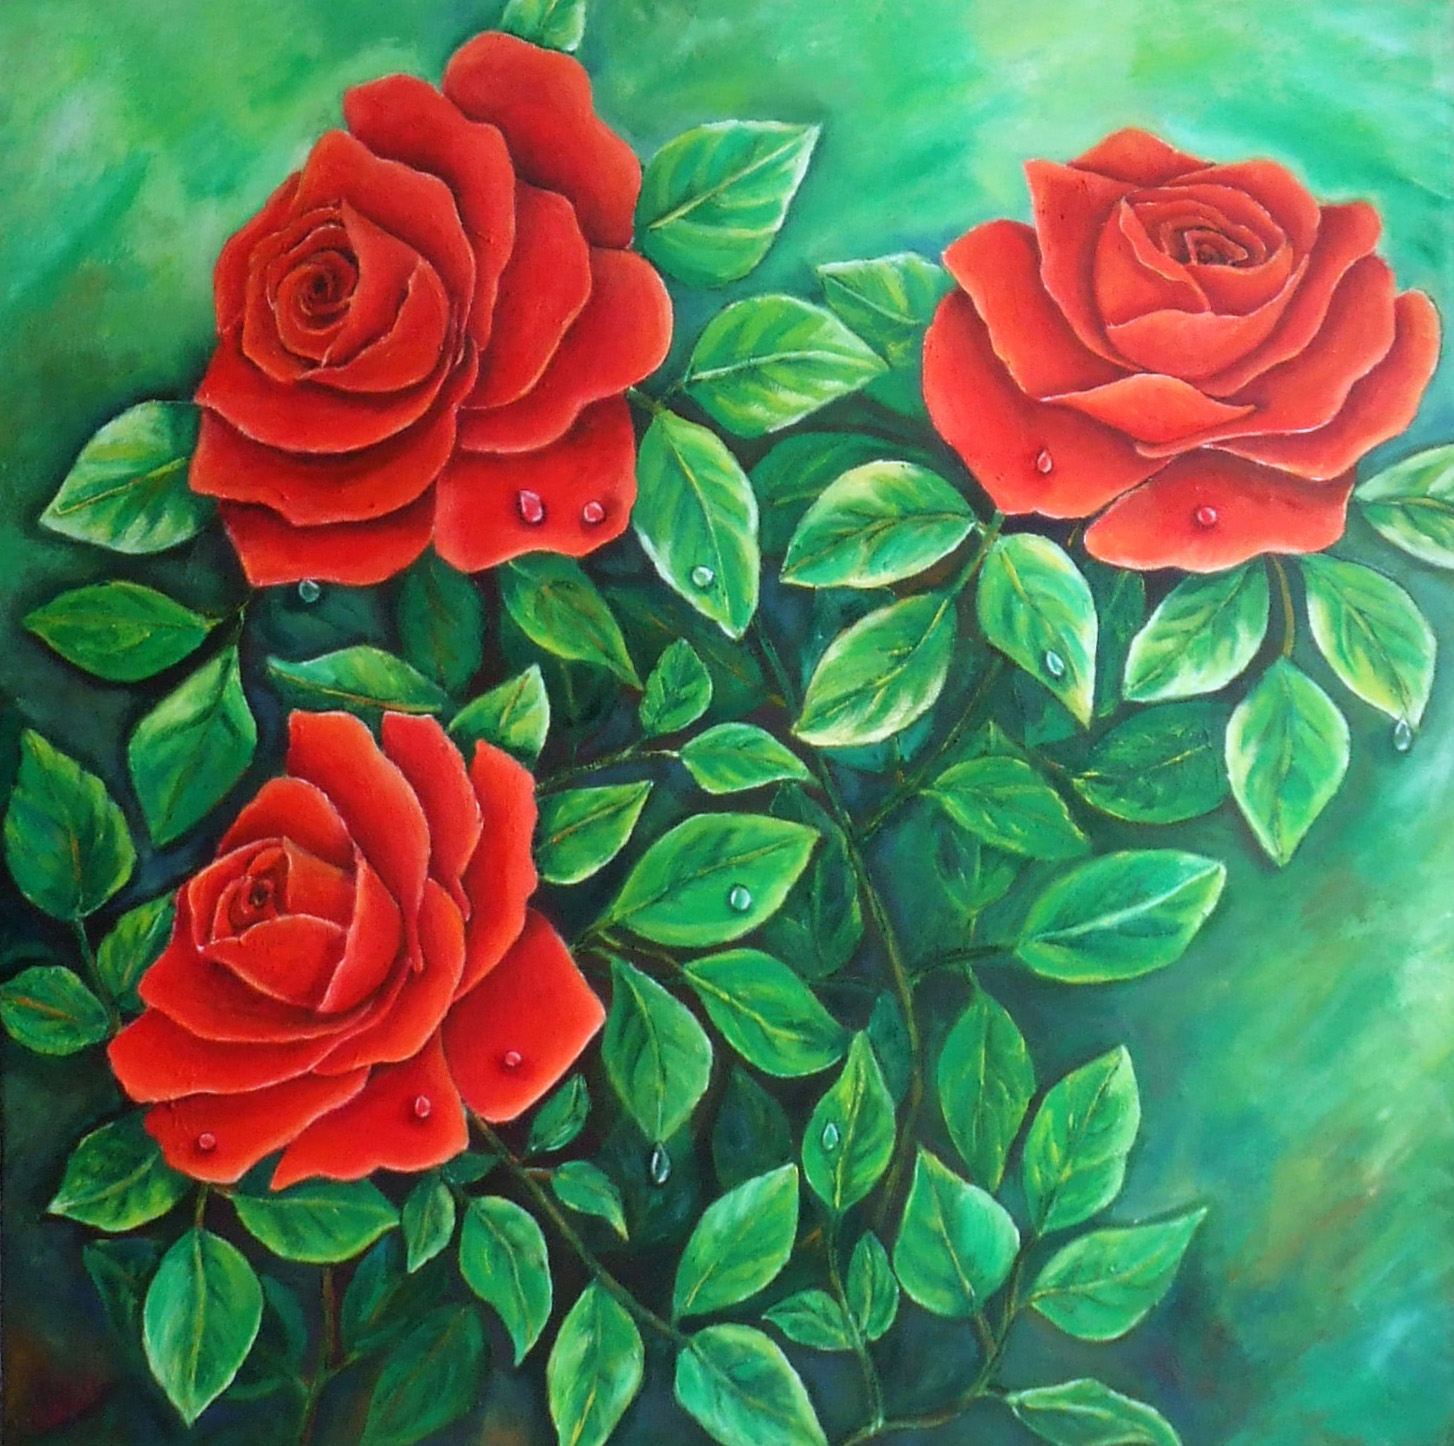 Imagenes De Rosa Rojas - Imagenes de rosa rojas con frase de amor Imagenes de